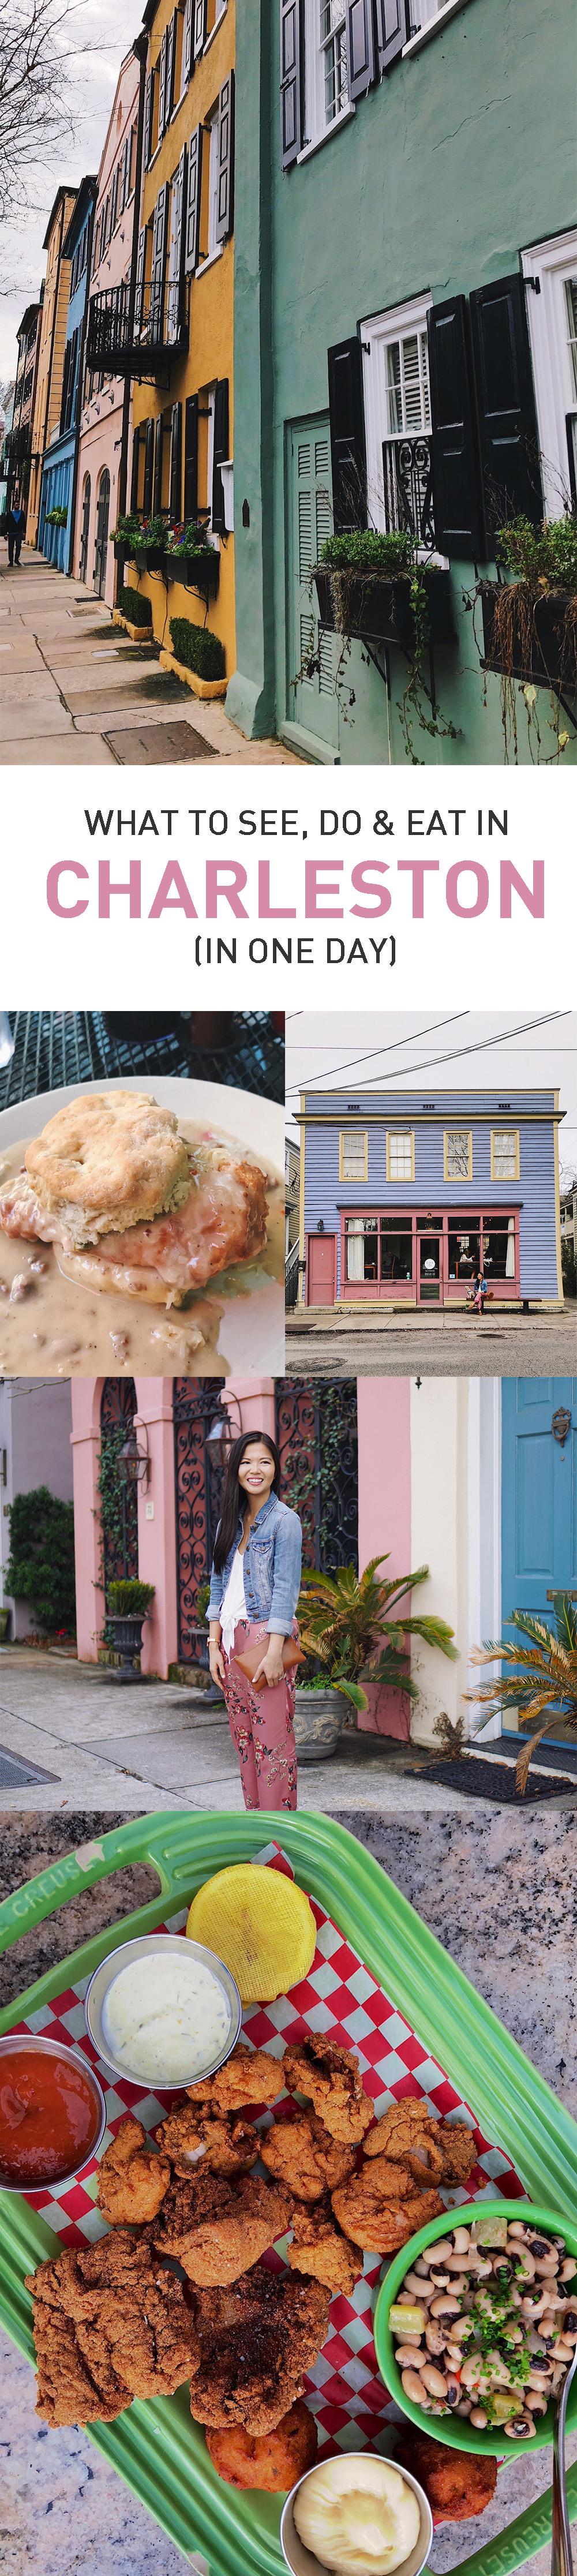 One Day Travel Guide to Charleston, South Carolina